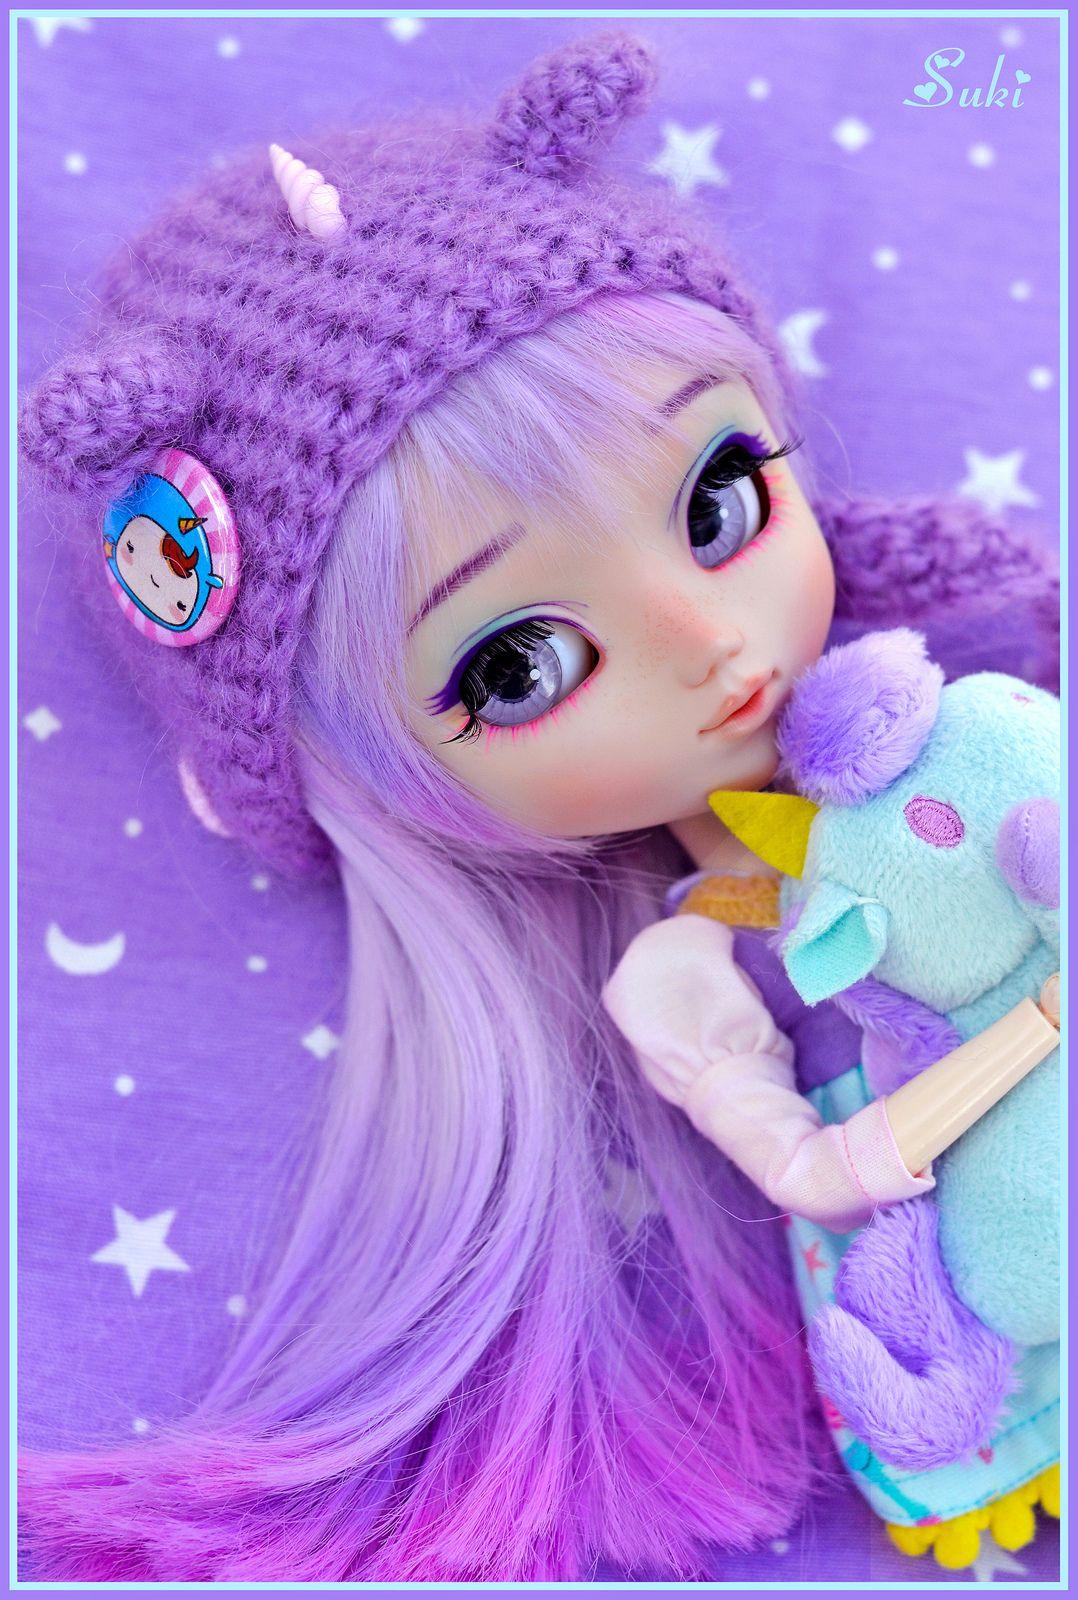 LovelyPullipdolls Cute dolls, Anime dolls, Bjd dolls girls